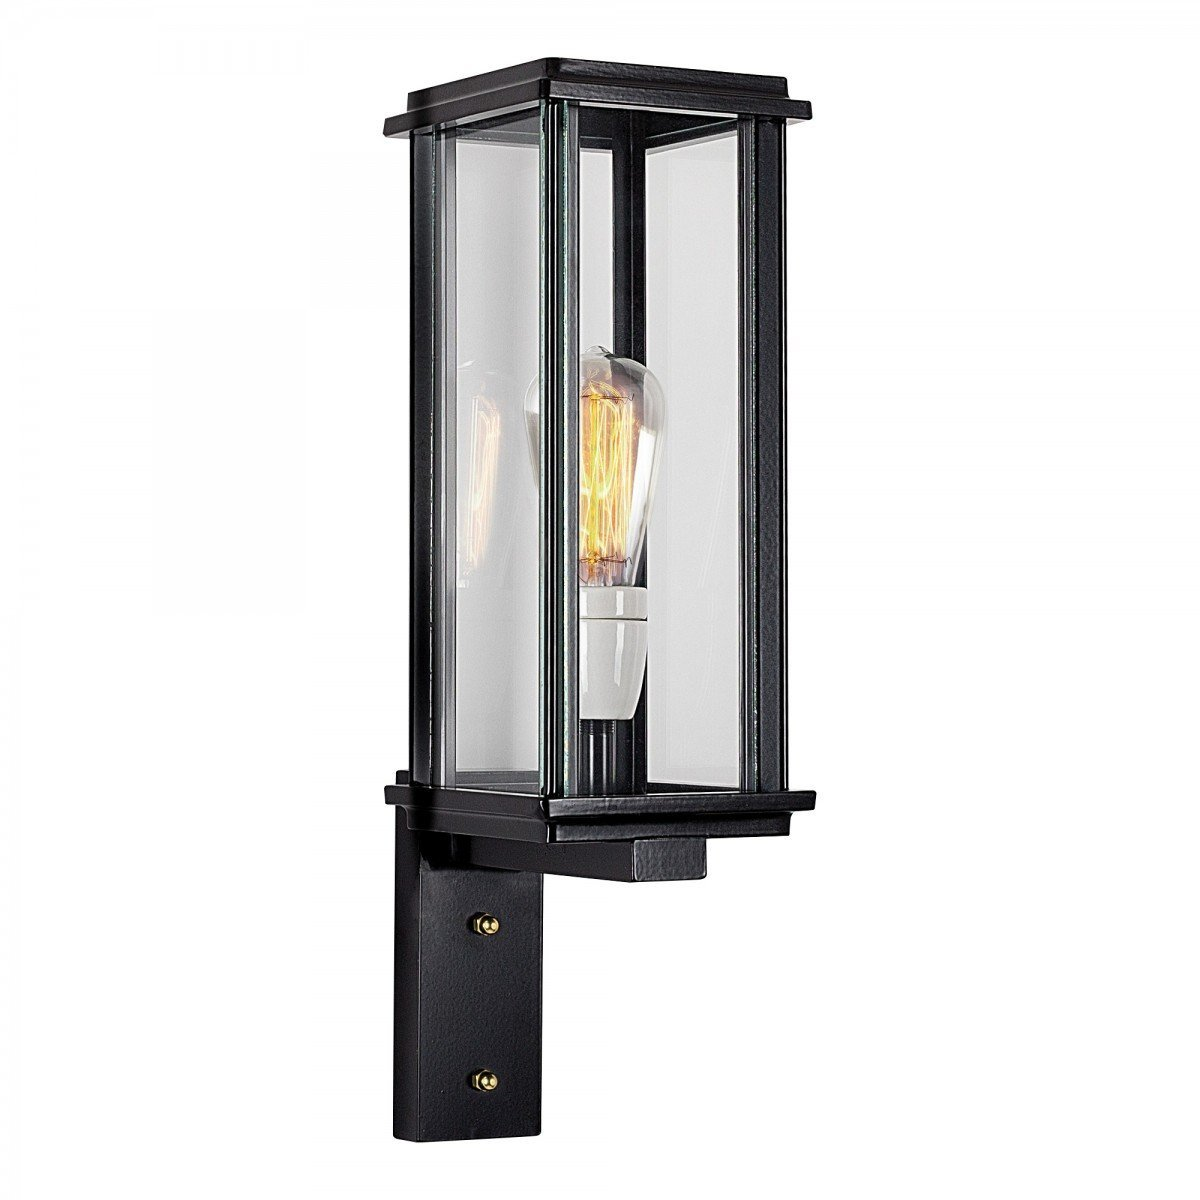 KS Verlichting Stijlvolle wandlamp Capital KS 6600